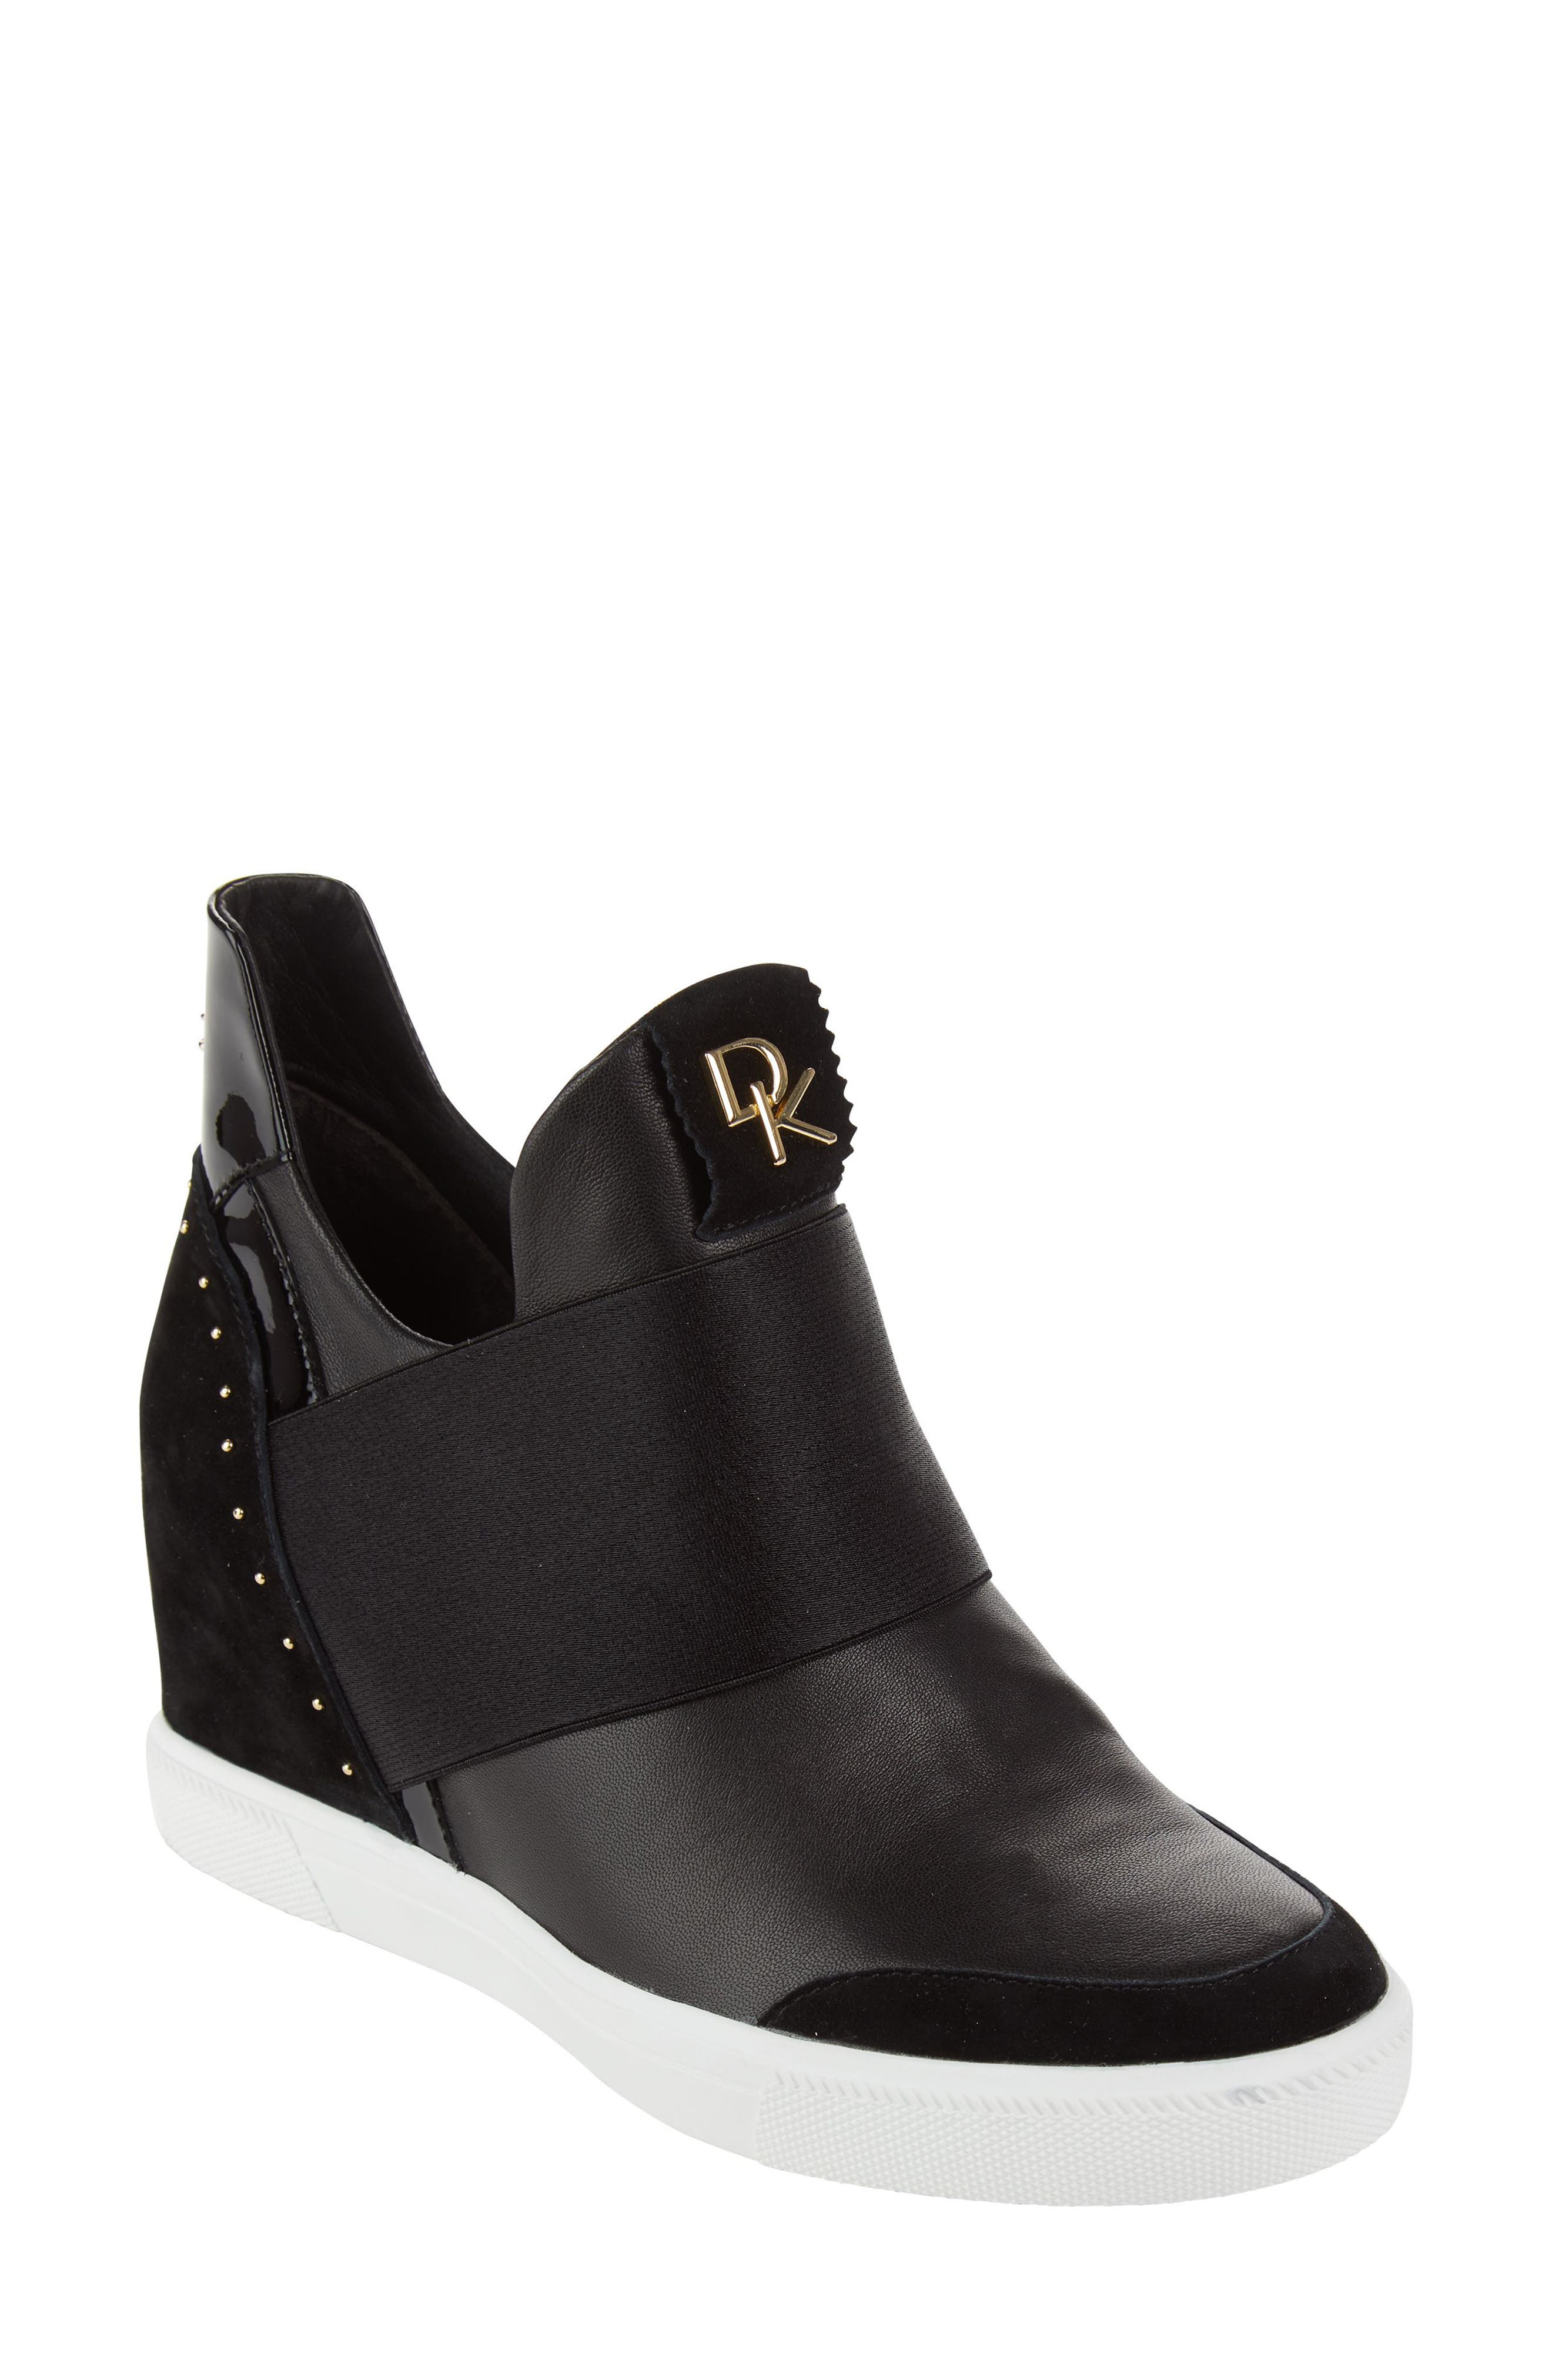 Donna Karan Cailin Studded Wedge Sneaker,                         Main,                         color, BLACK LEATHER